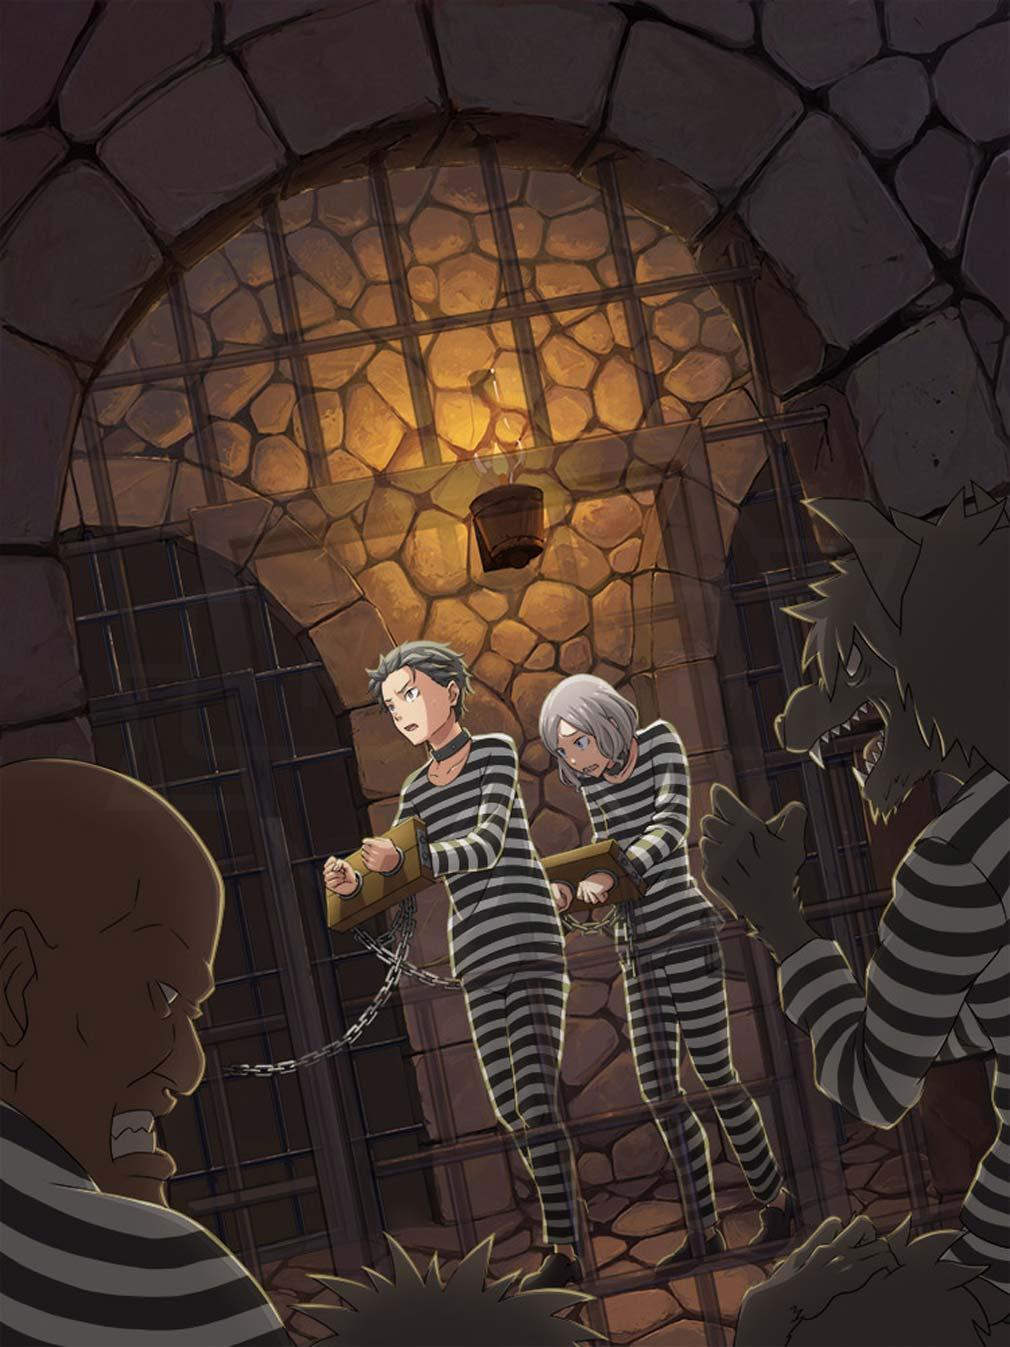 Re:ゼロから始める異世界生活 Lost in Memories(リゼロス) とある事件に巻き込まれ逮捕されてしまったスクリーンショット